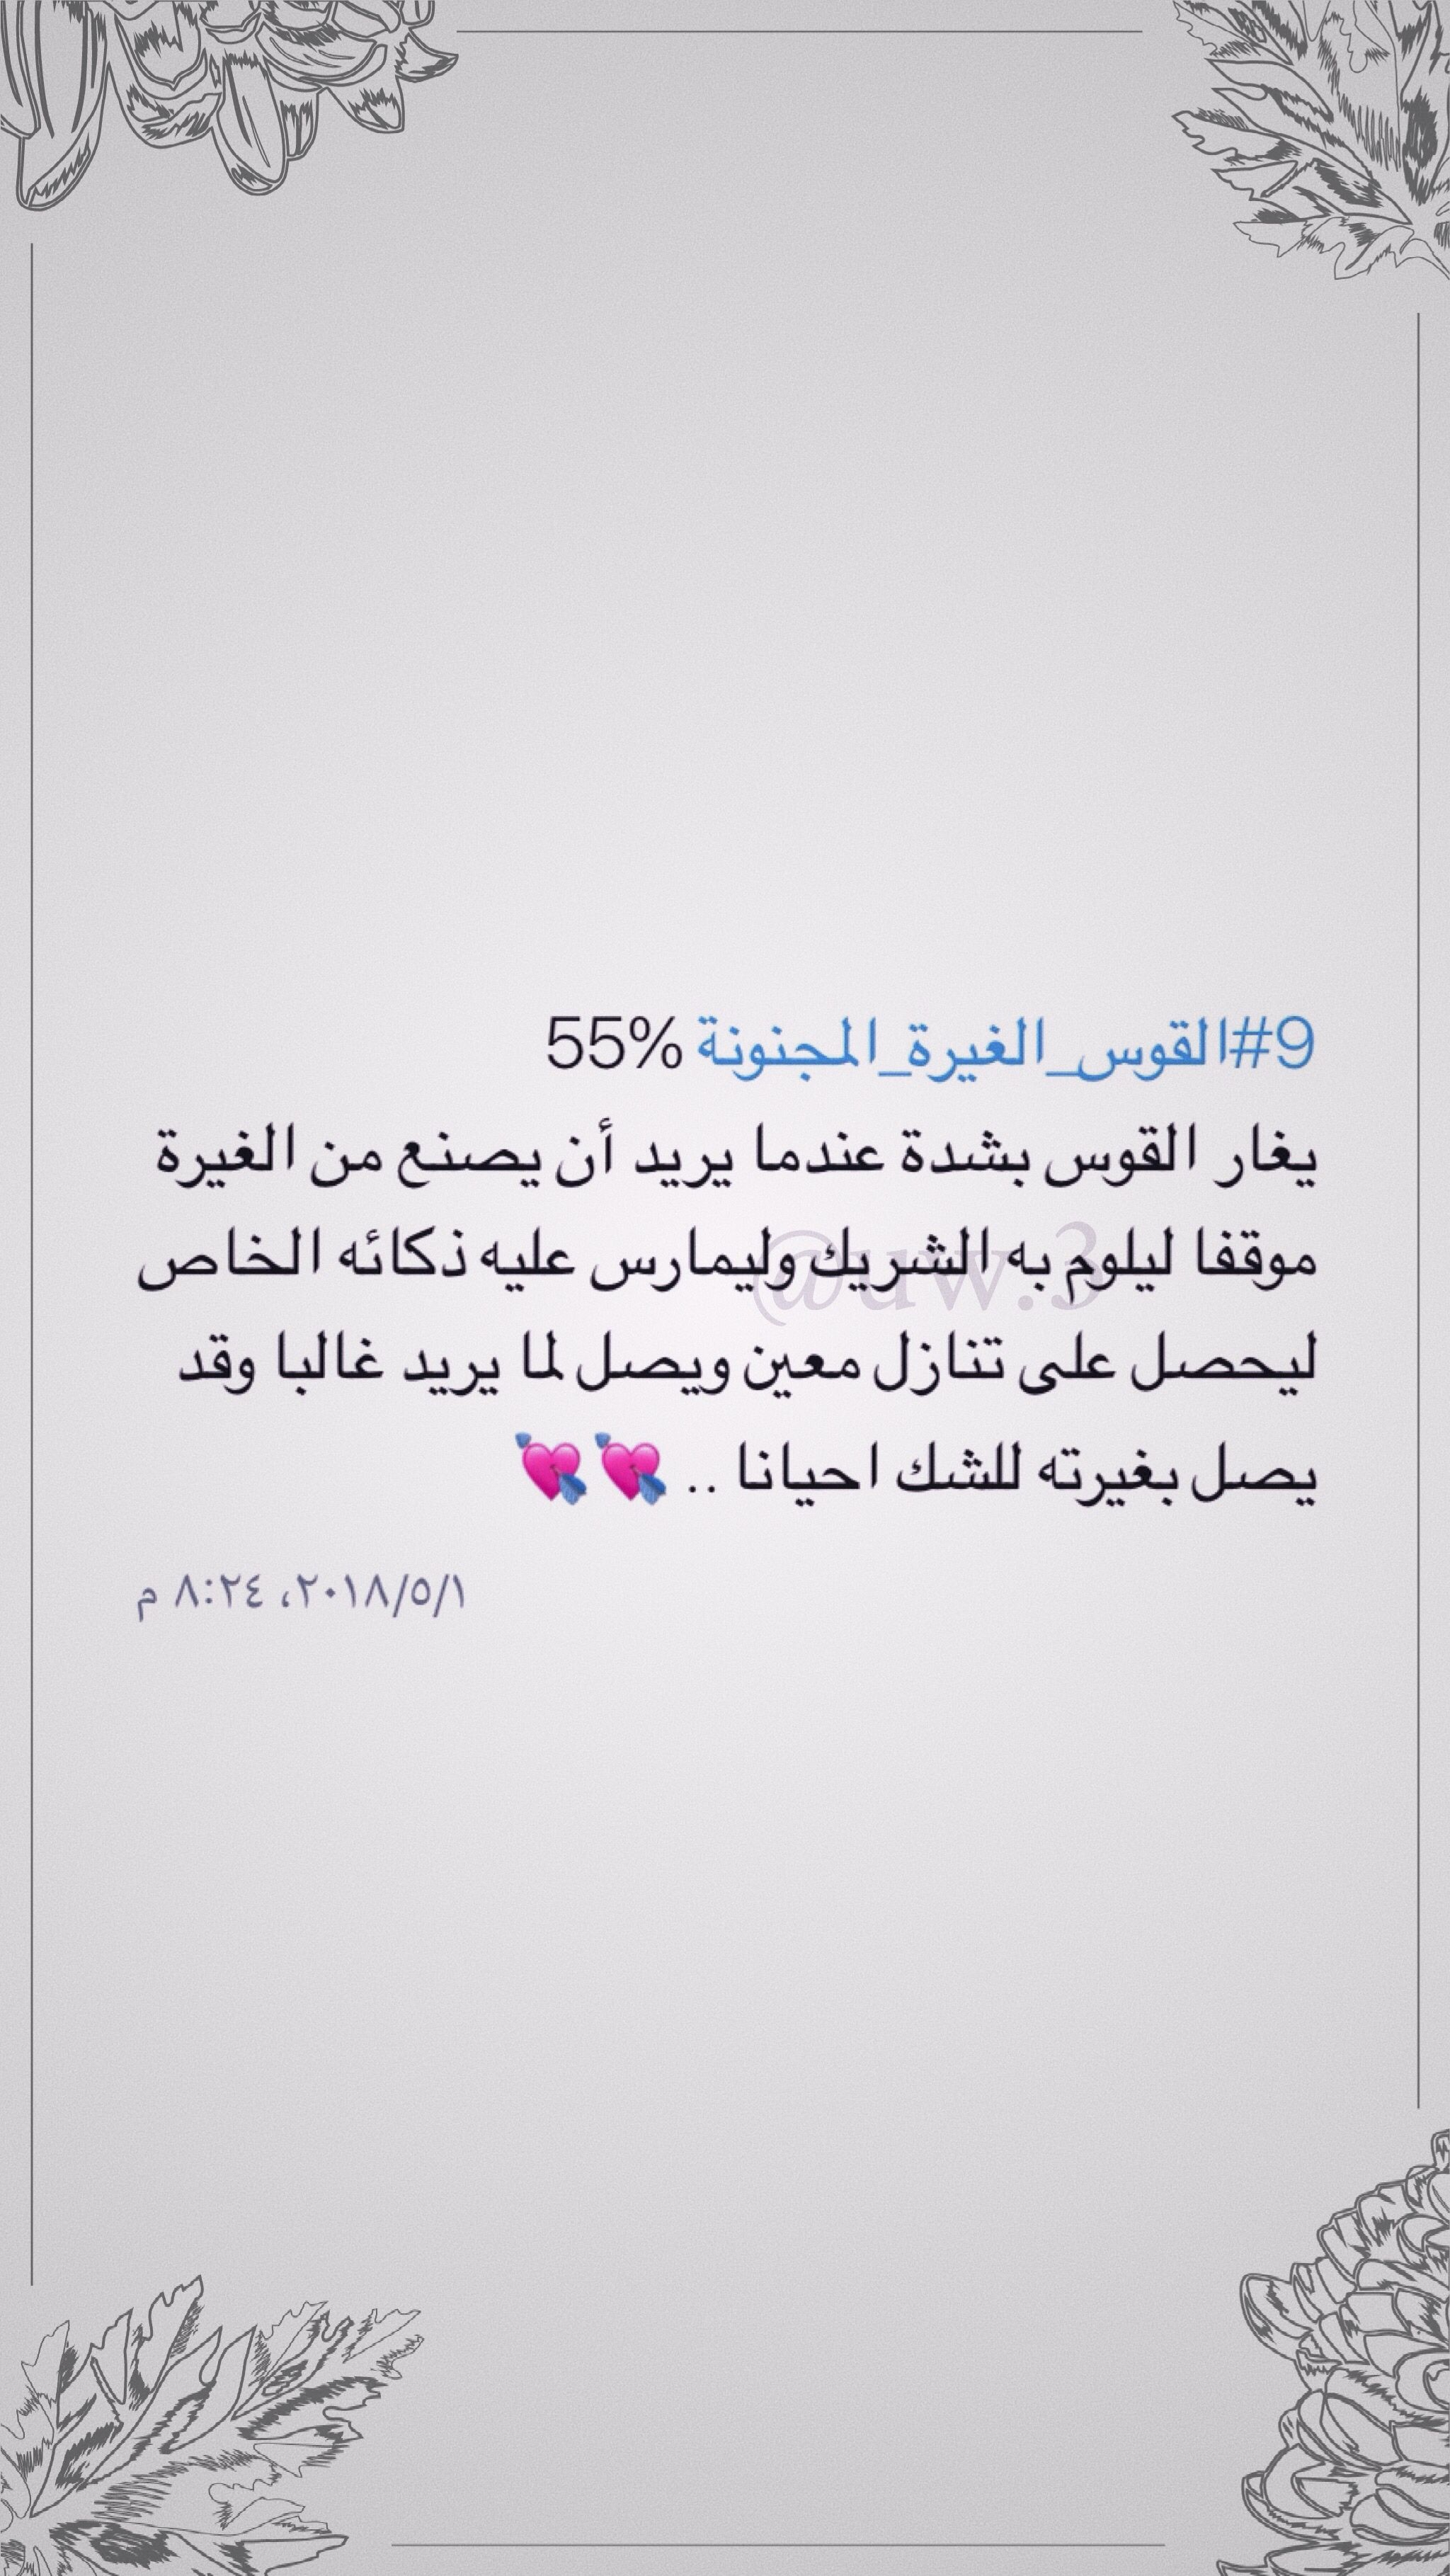 ابراج صور ابراج برجك اليوم صور حب العراق بغداد Self Motivation Quotes Love Quotes